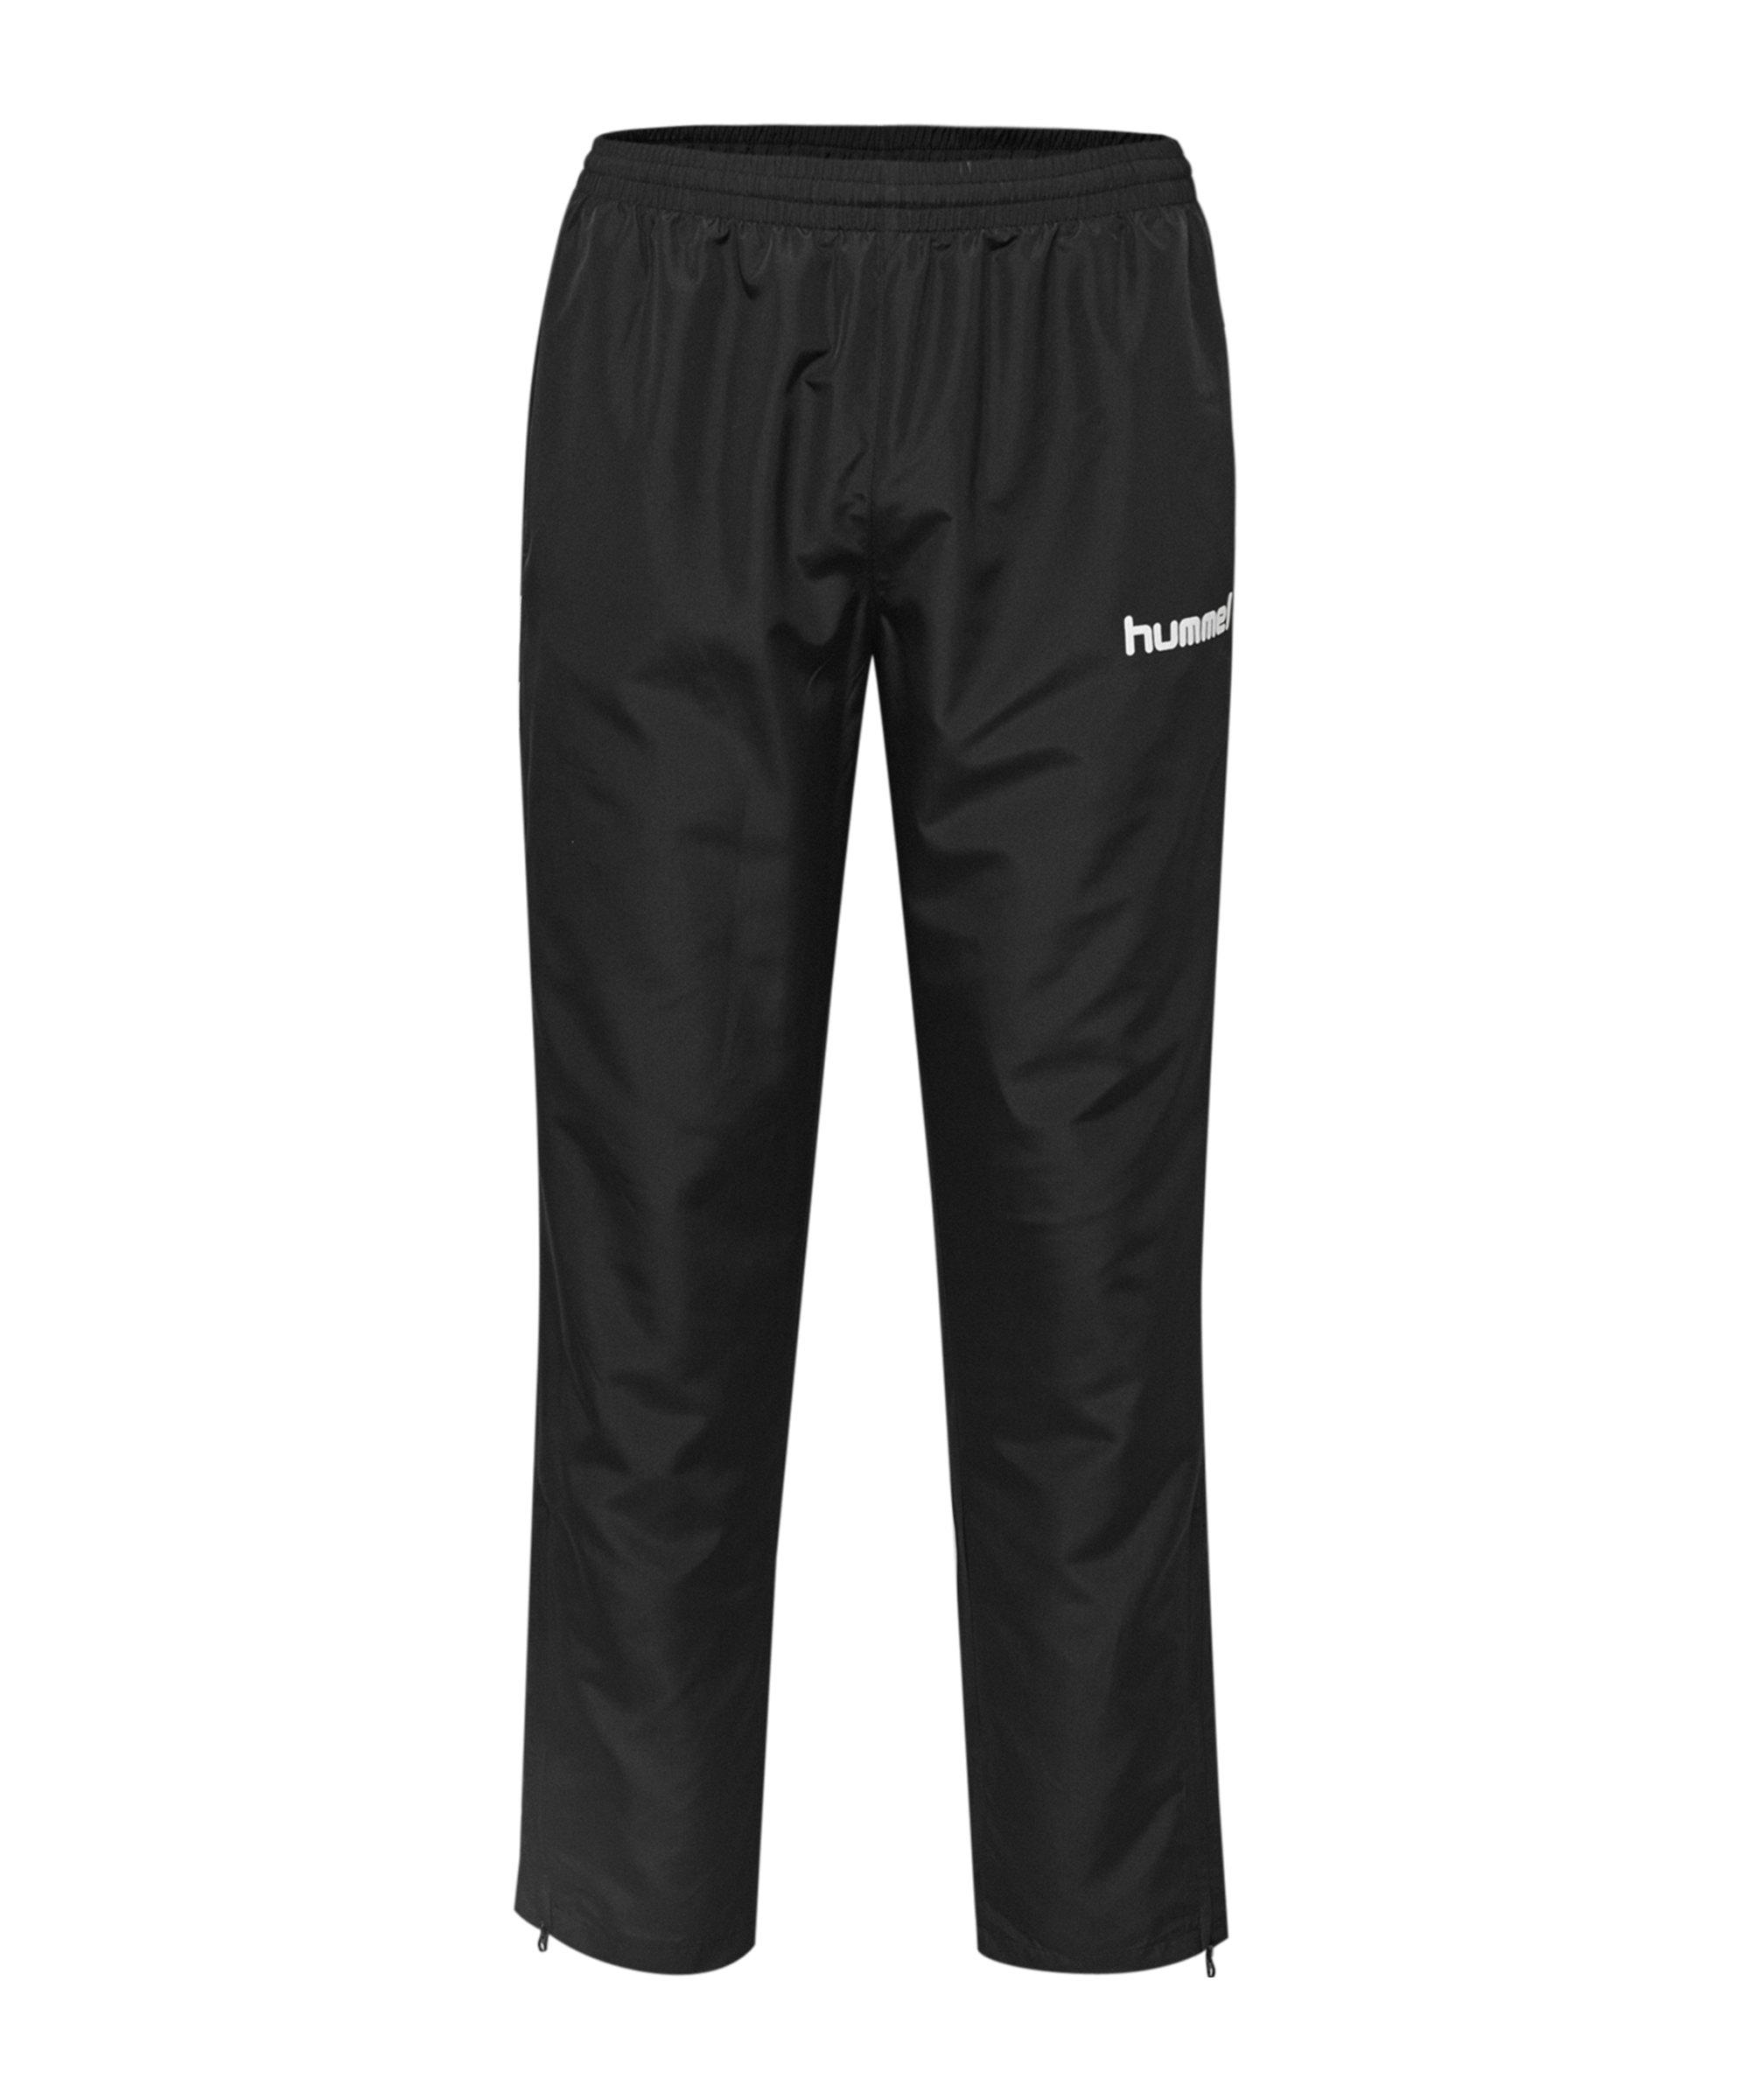 Hummel Core Micro Pants Trainingshose Schwar F2001 - schwarz